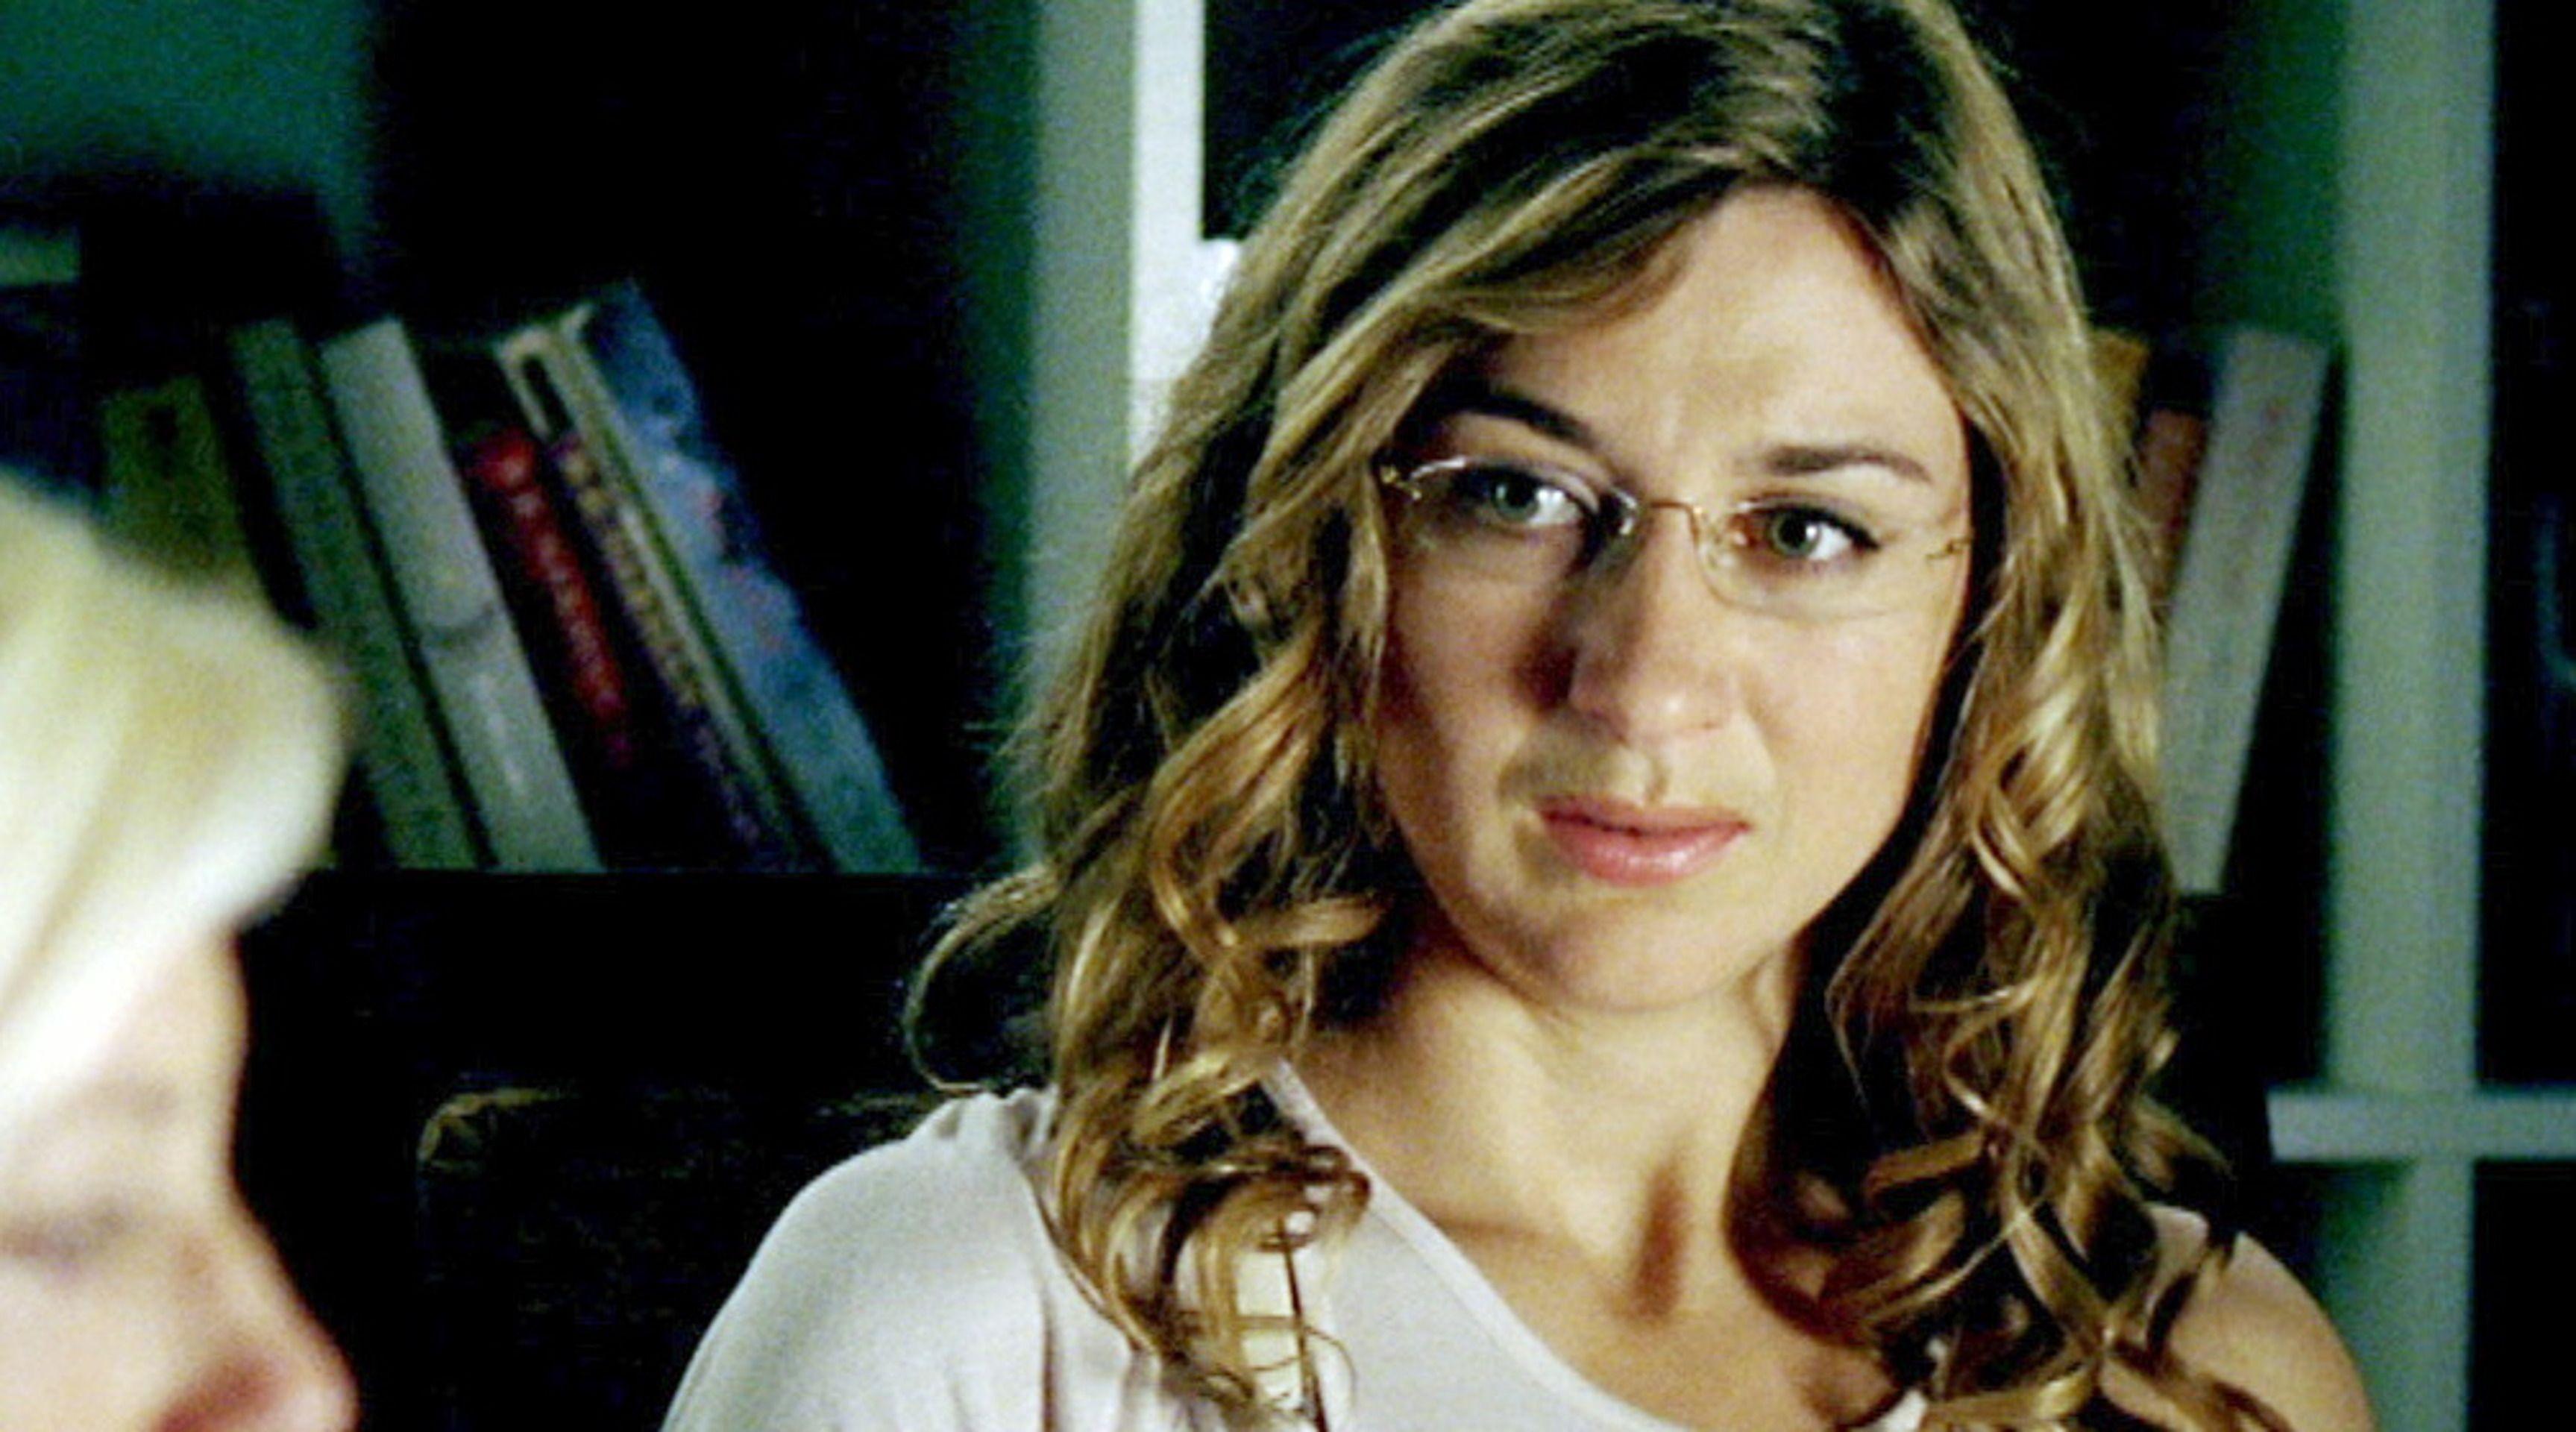 Susannah Wise Susannah Wise new picture